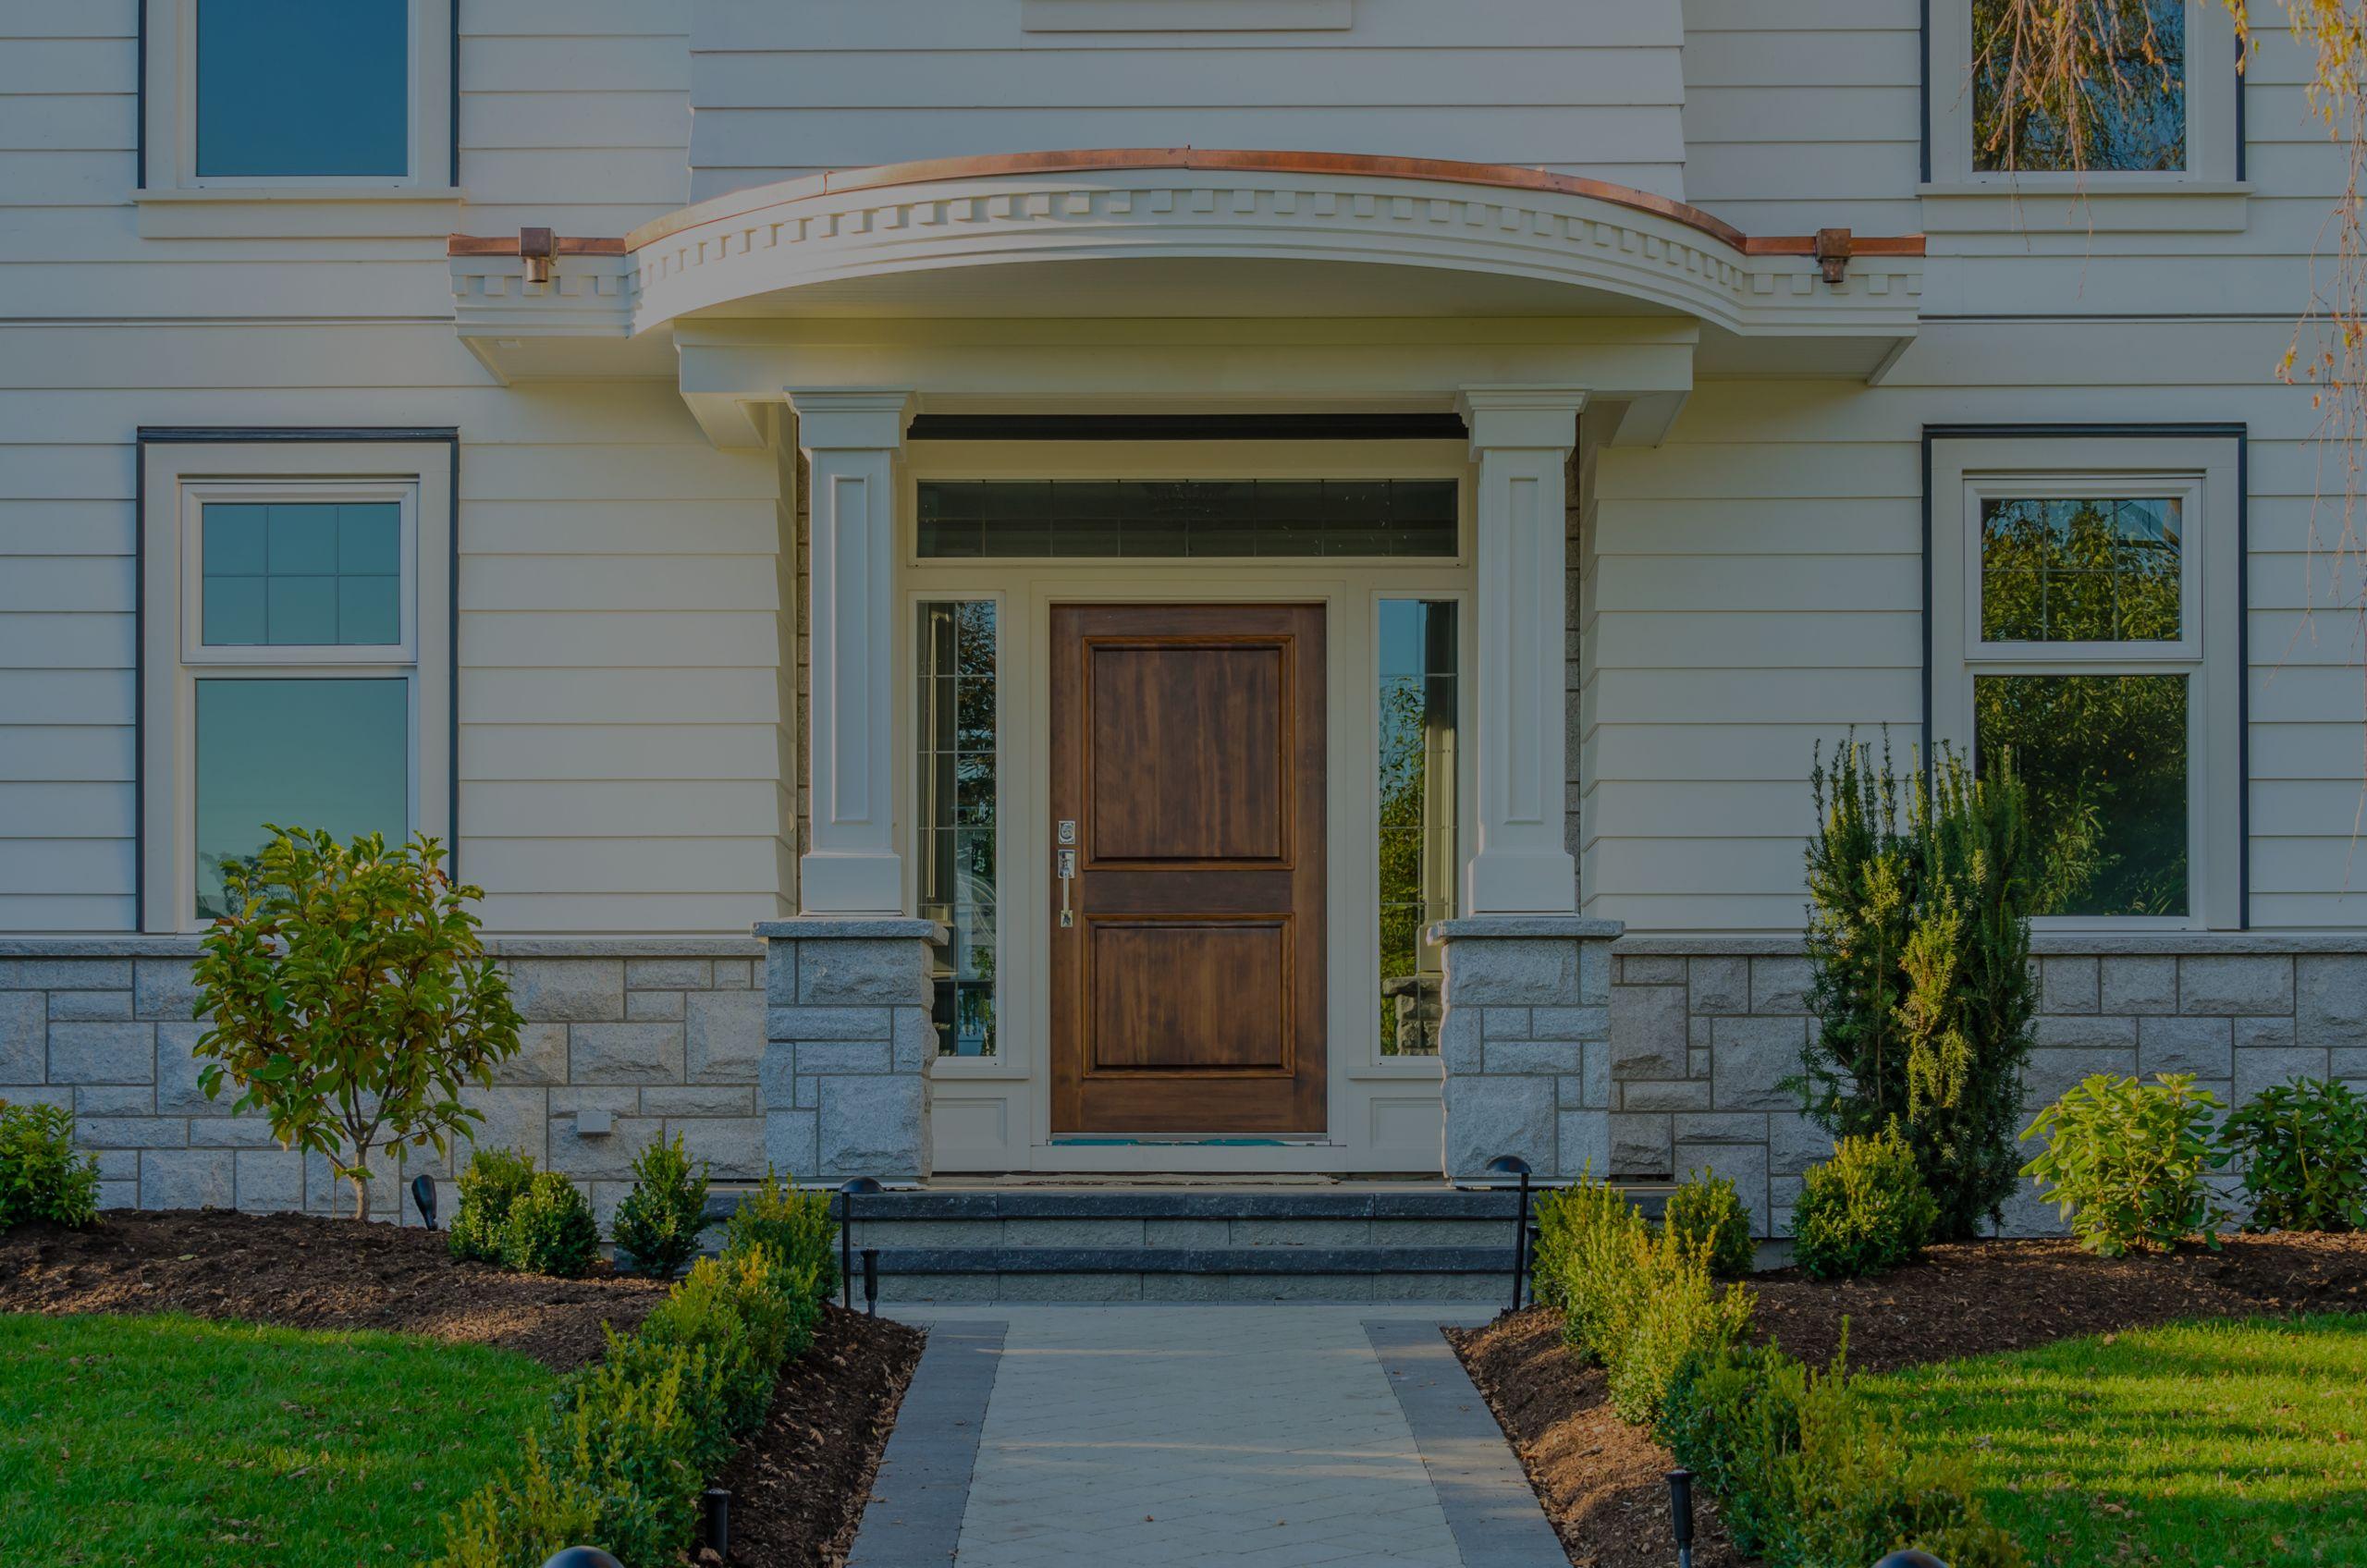 Loans for Fixer-Upper Homes